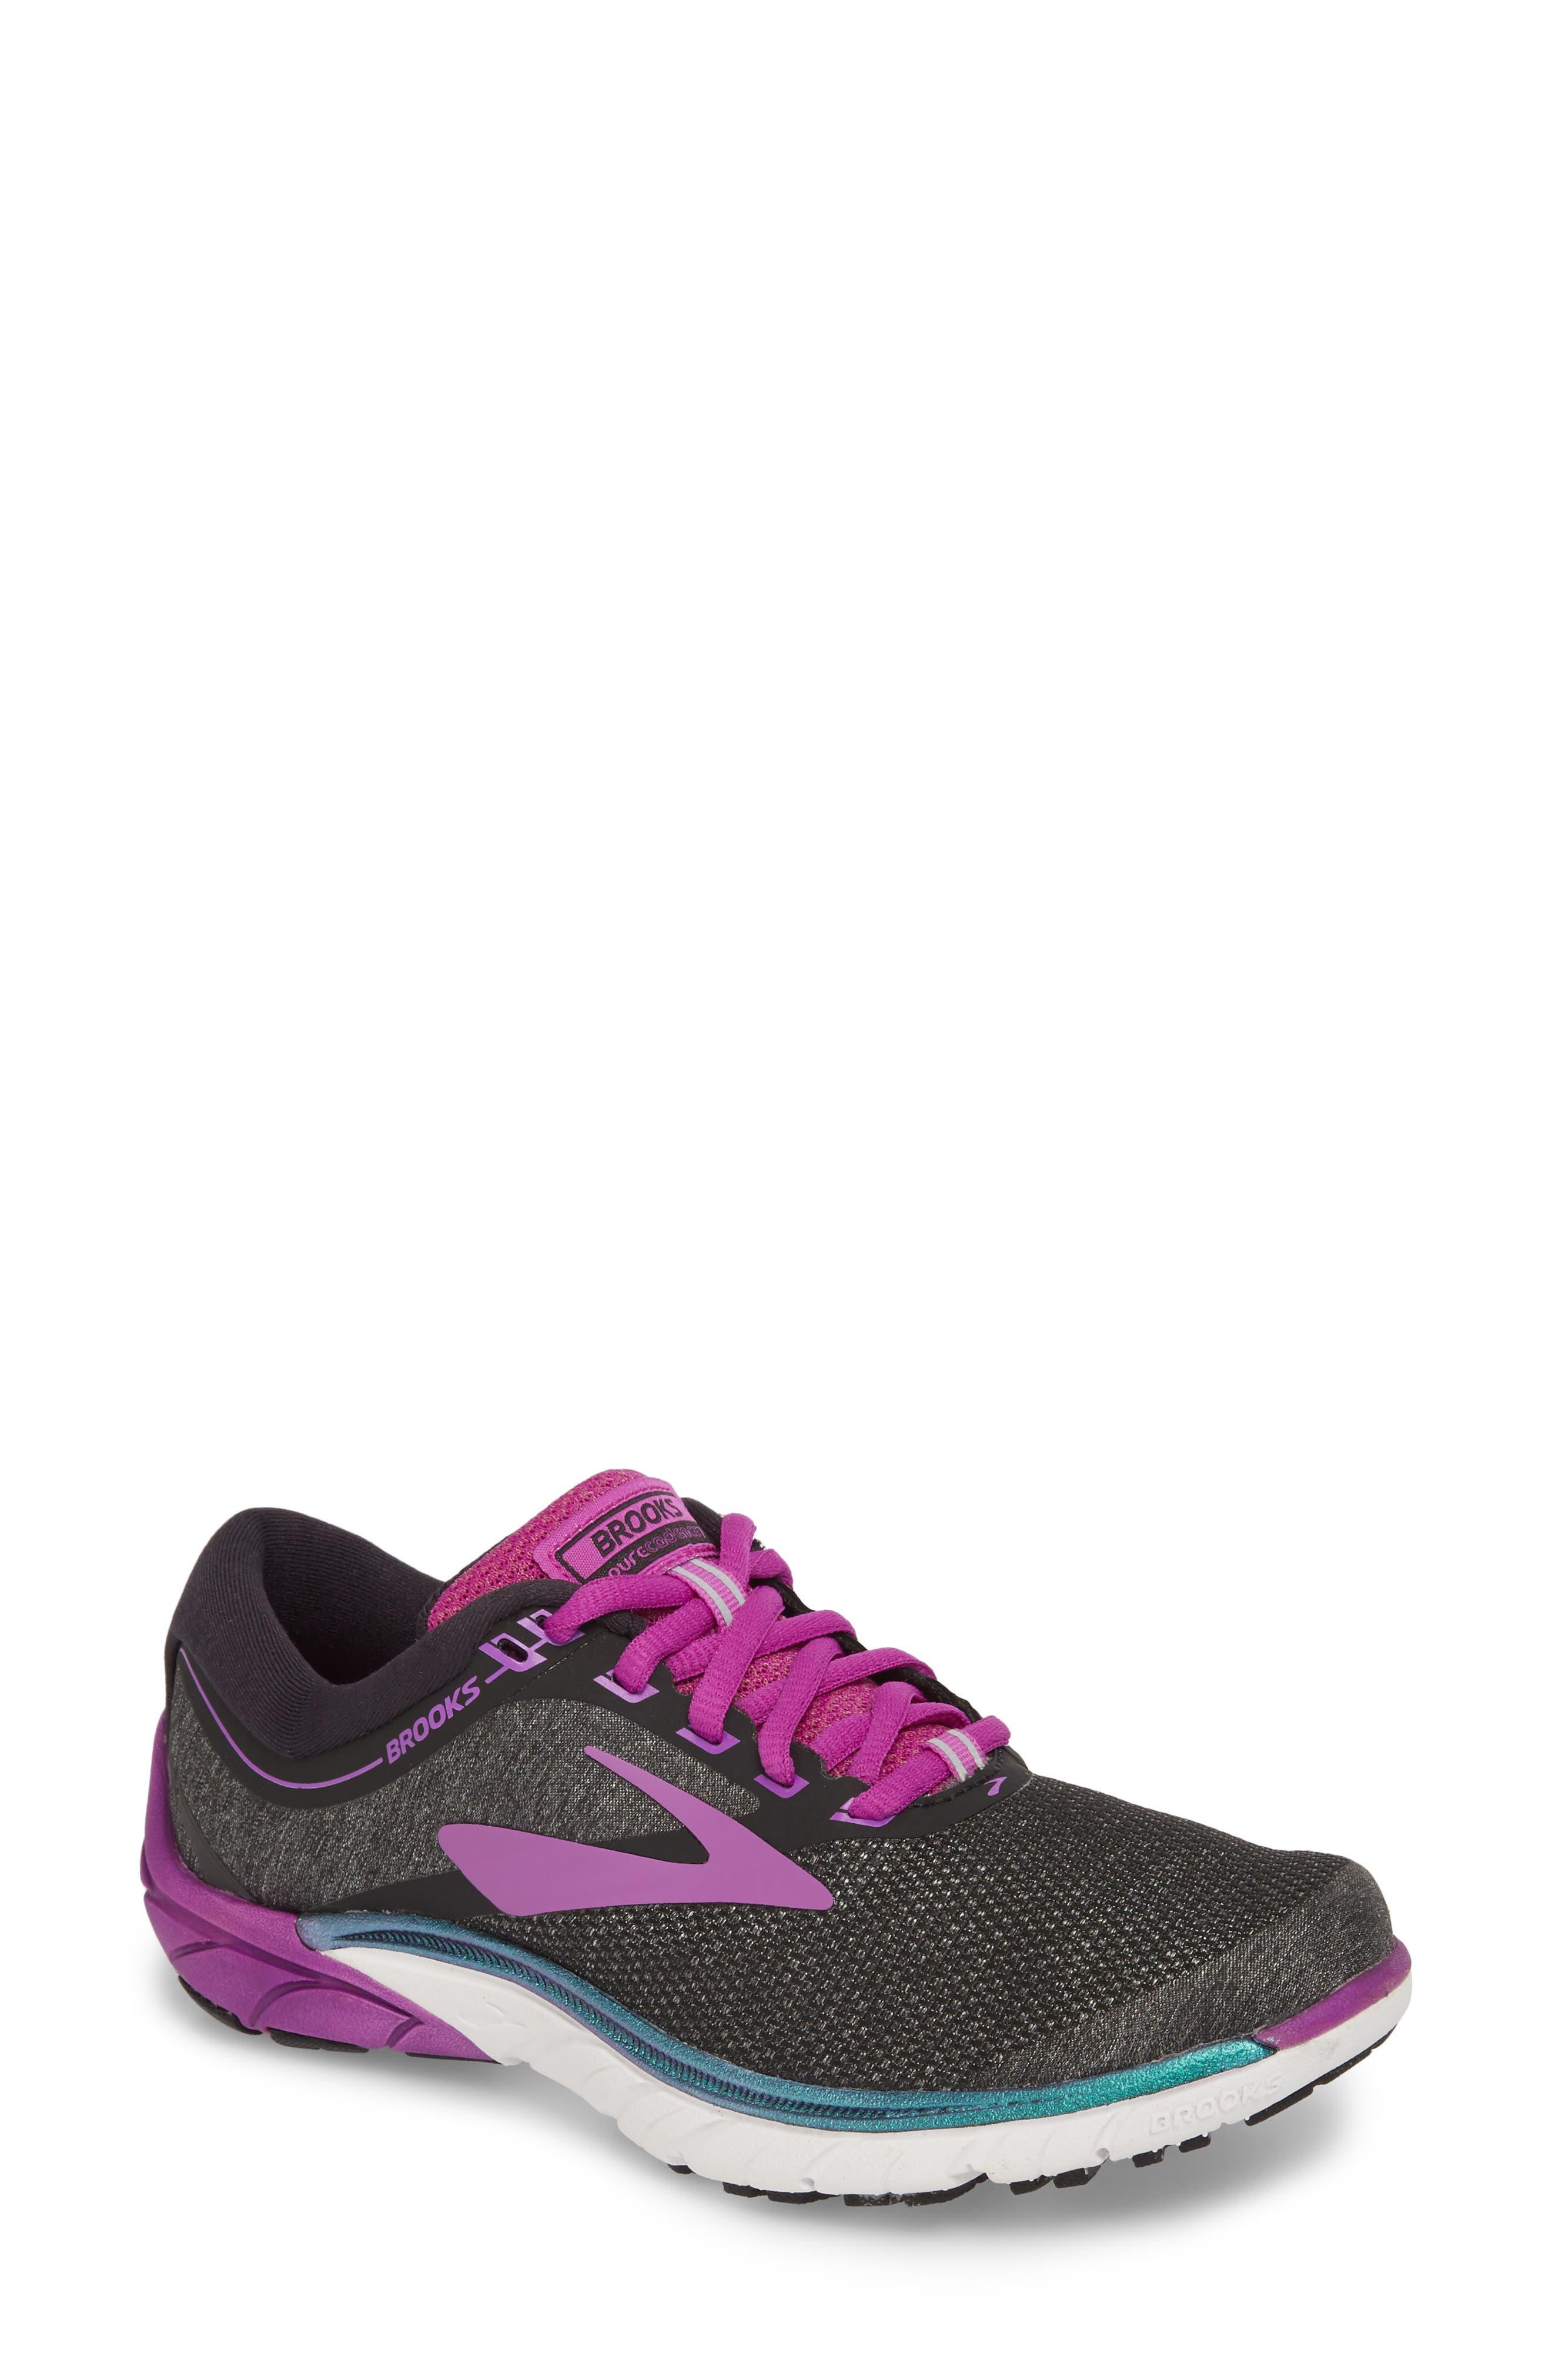 PureCadence 7 Road Running Shoe,                             Main thumbnail 1, color,                             BLACK/ PURPLE/ MULTI